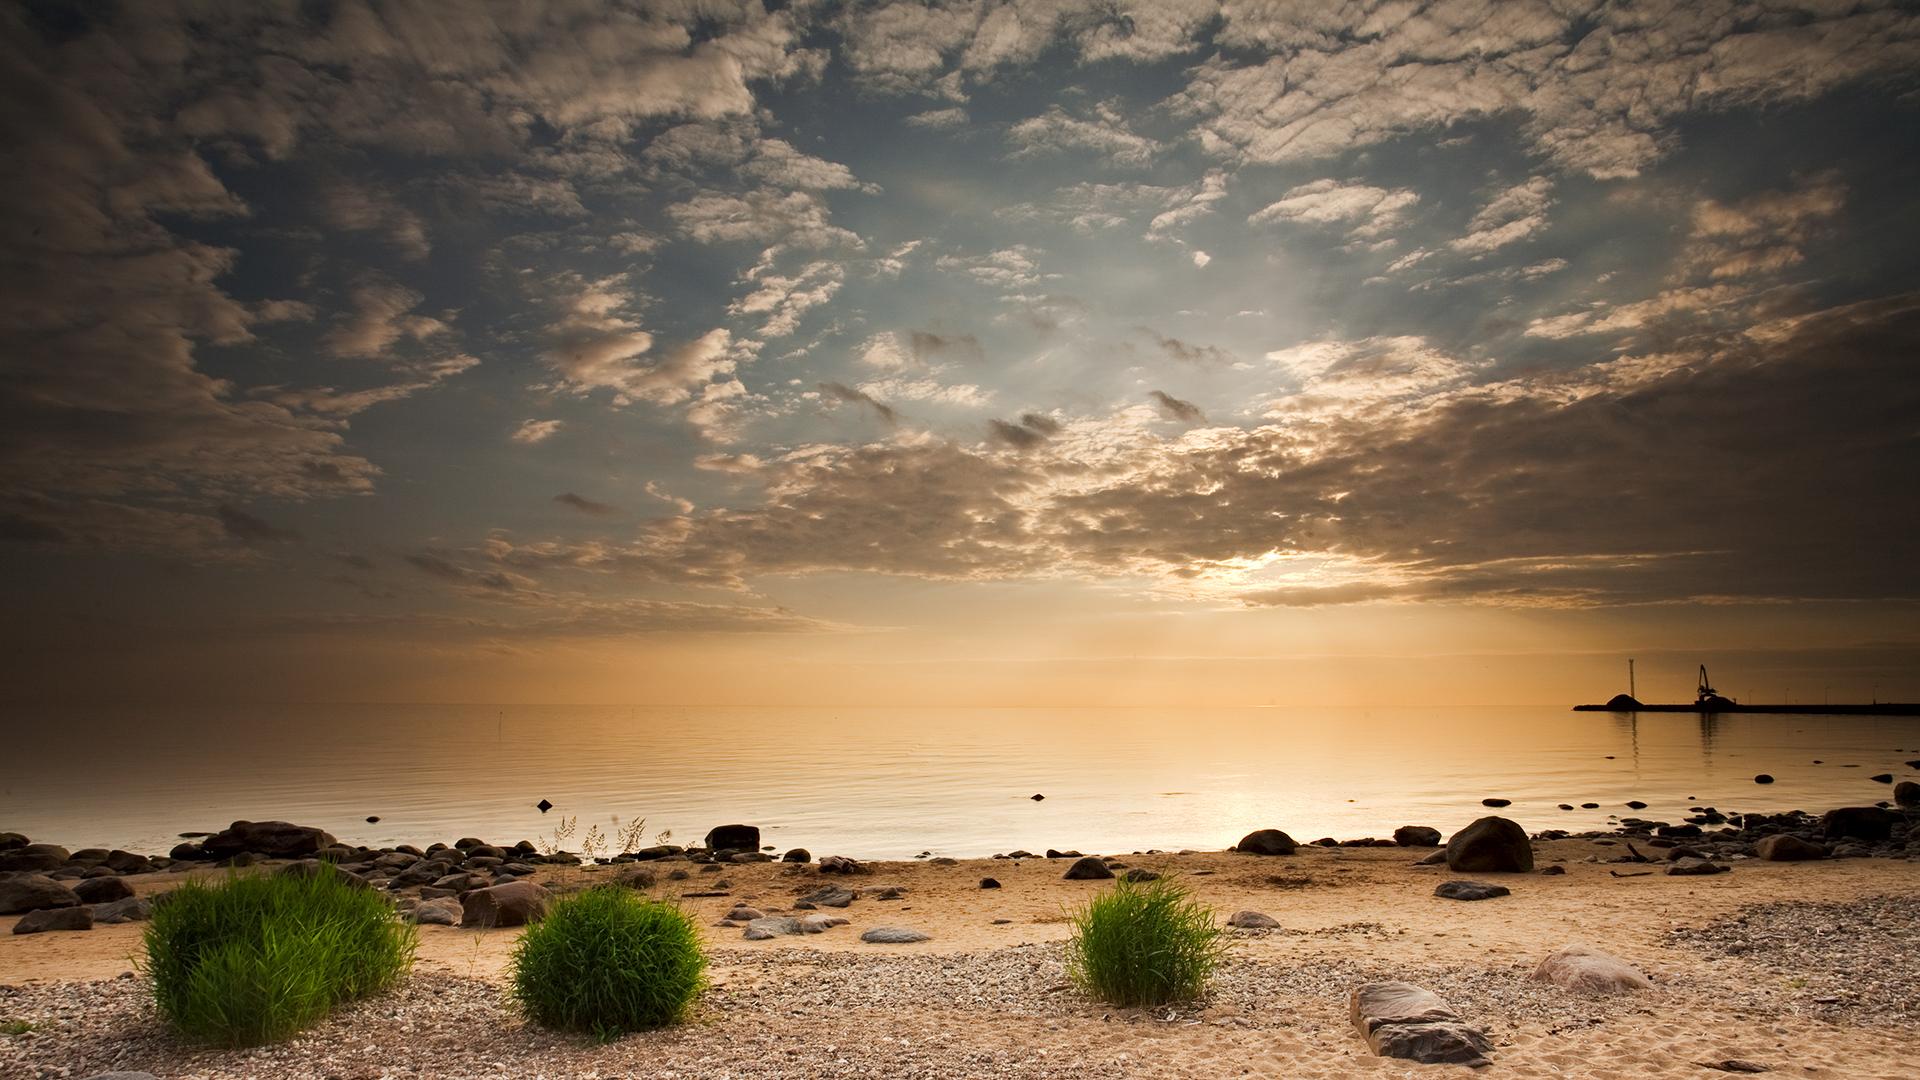 Skulte_Vidzeme seashore, Latvia...